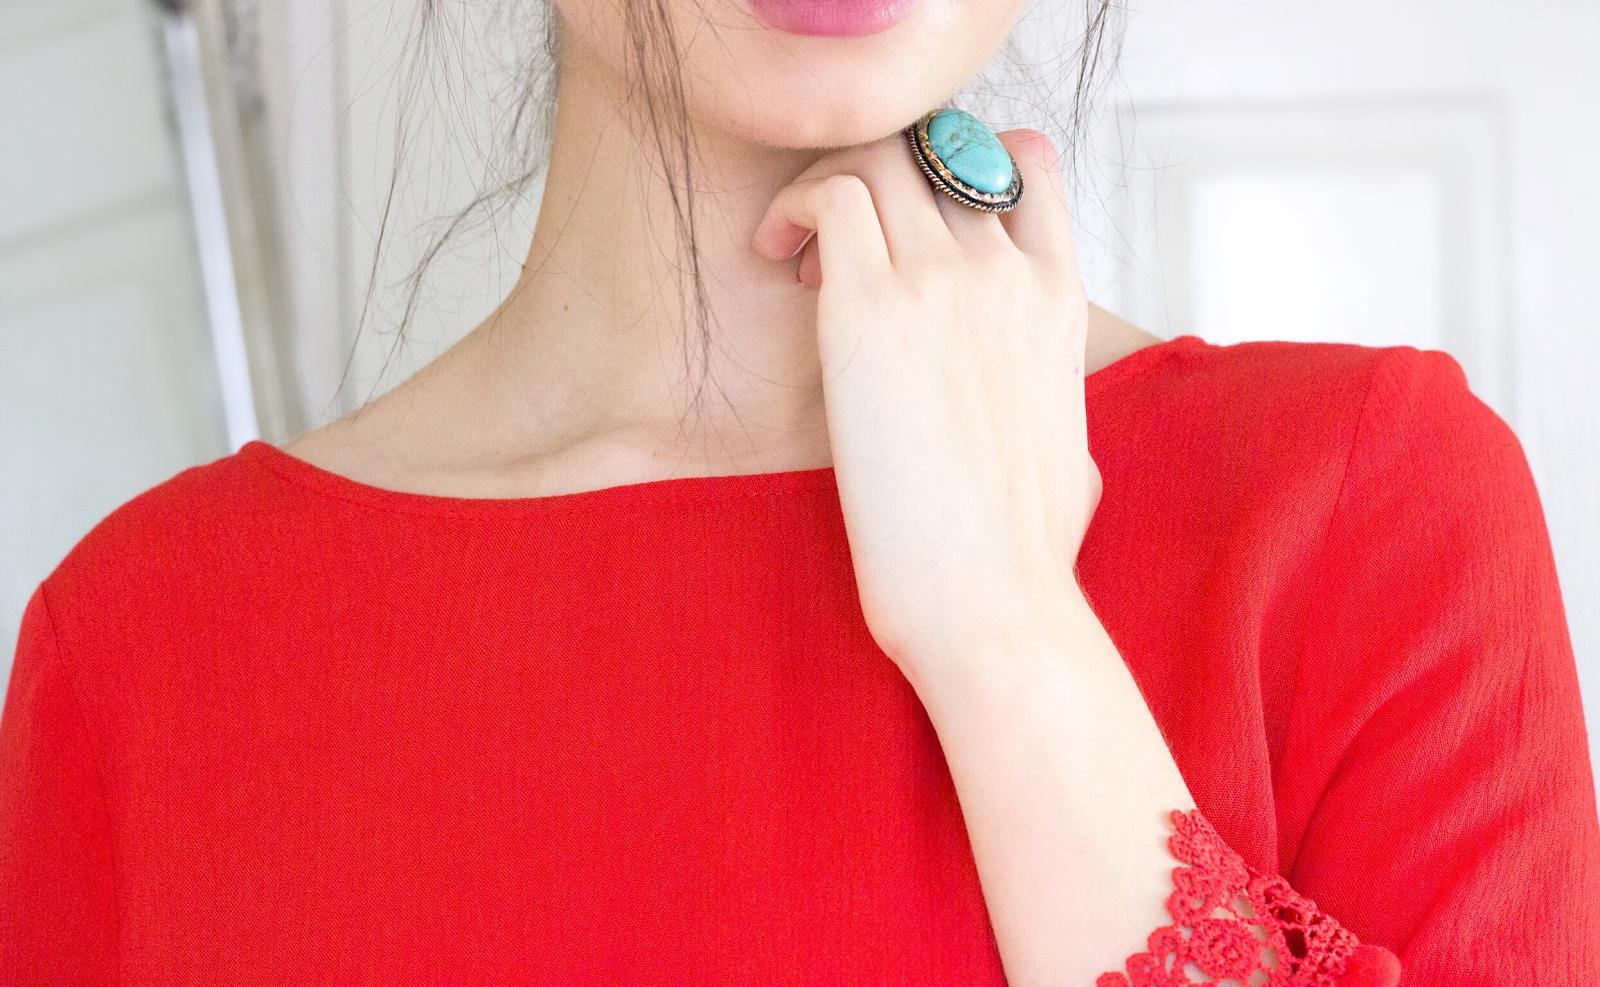 spring, summer, spring fashion, summer fashion, coachella, coachella fashion, hm, h&m, red blouse, lace blouse, british blogger, beauty blogger, fashion blogger, lifestyle blogger